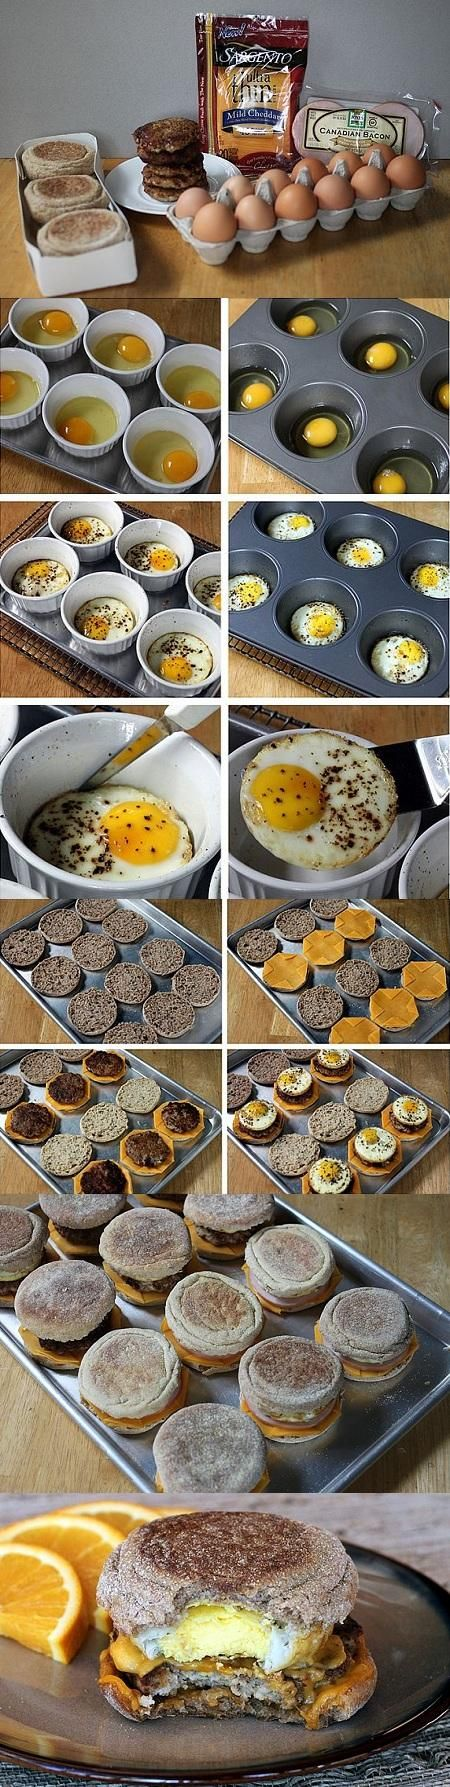 Healthy-Egg-McMuffin-Copycats - Joybx